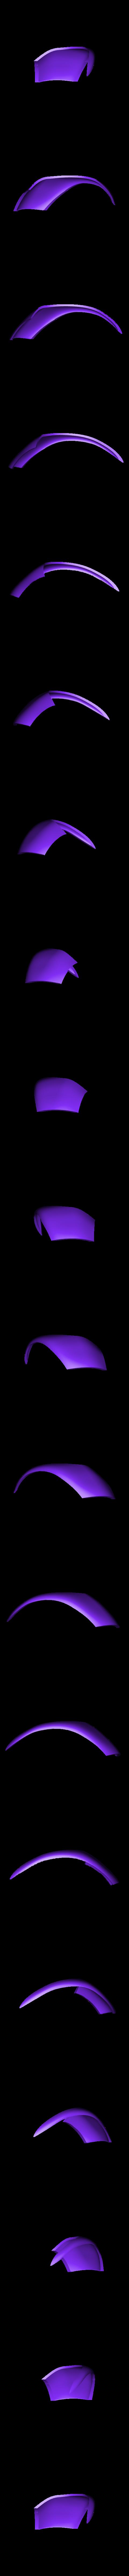 azuro_top2.stl Download free STL file Azuro Computer Mouse • 3D printer model, MaxMKA